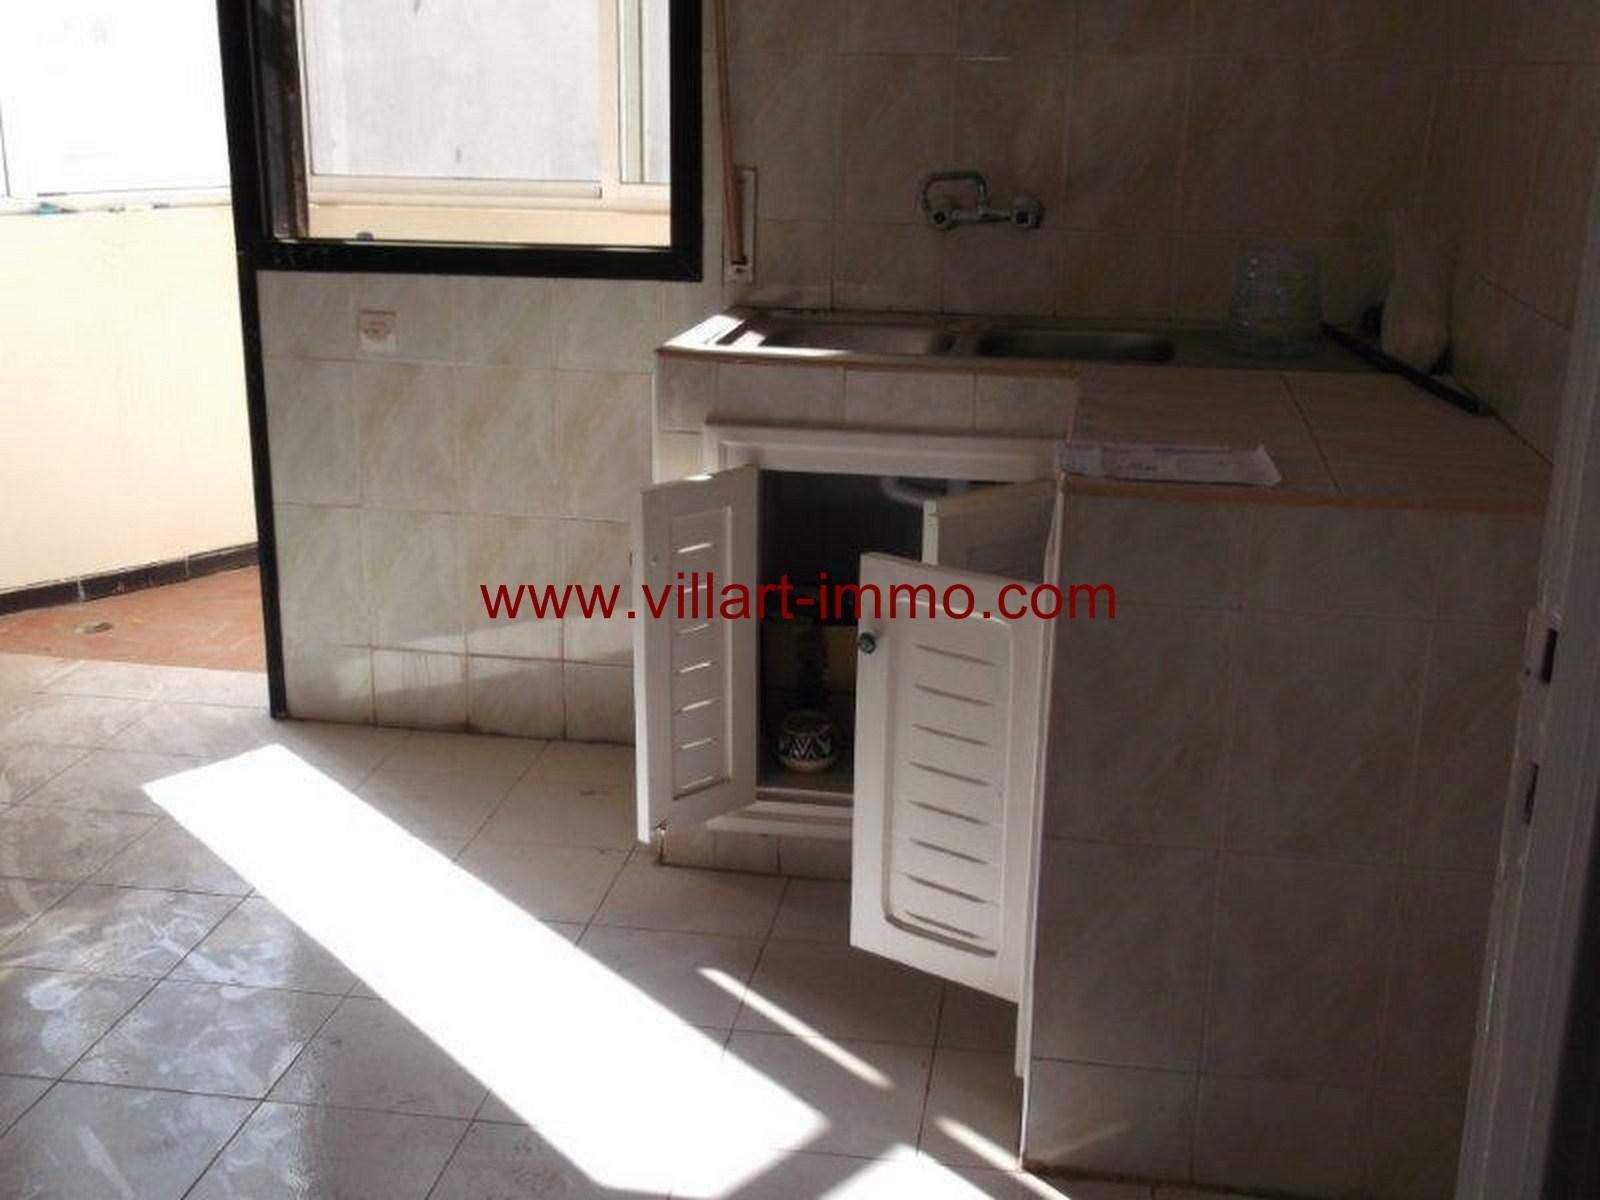 6- Vente -appartement-Tanger-Maroc–Centre-De-Ville-Cuisine -VA91-Villartimmo